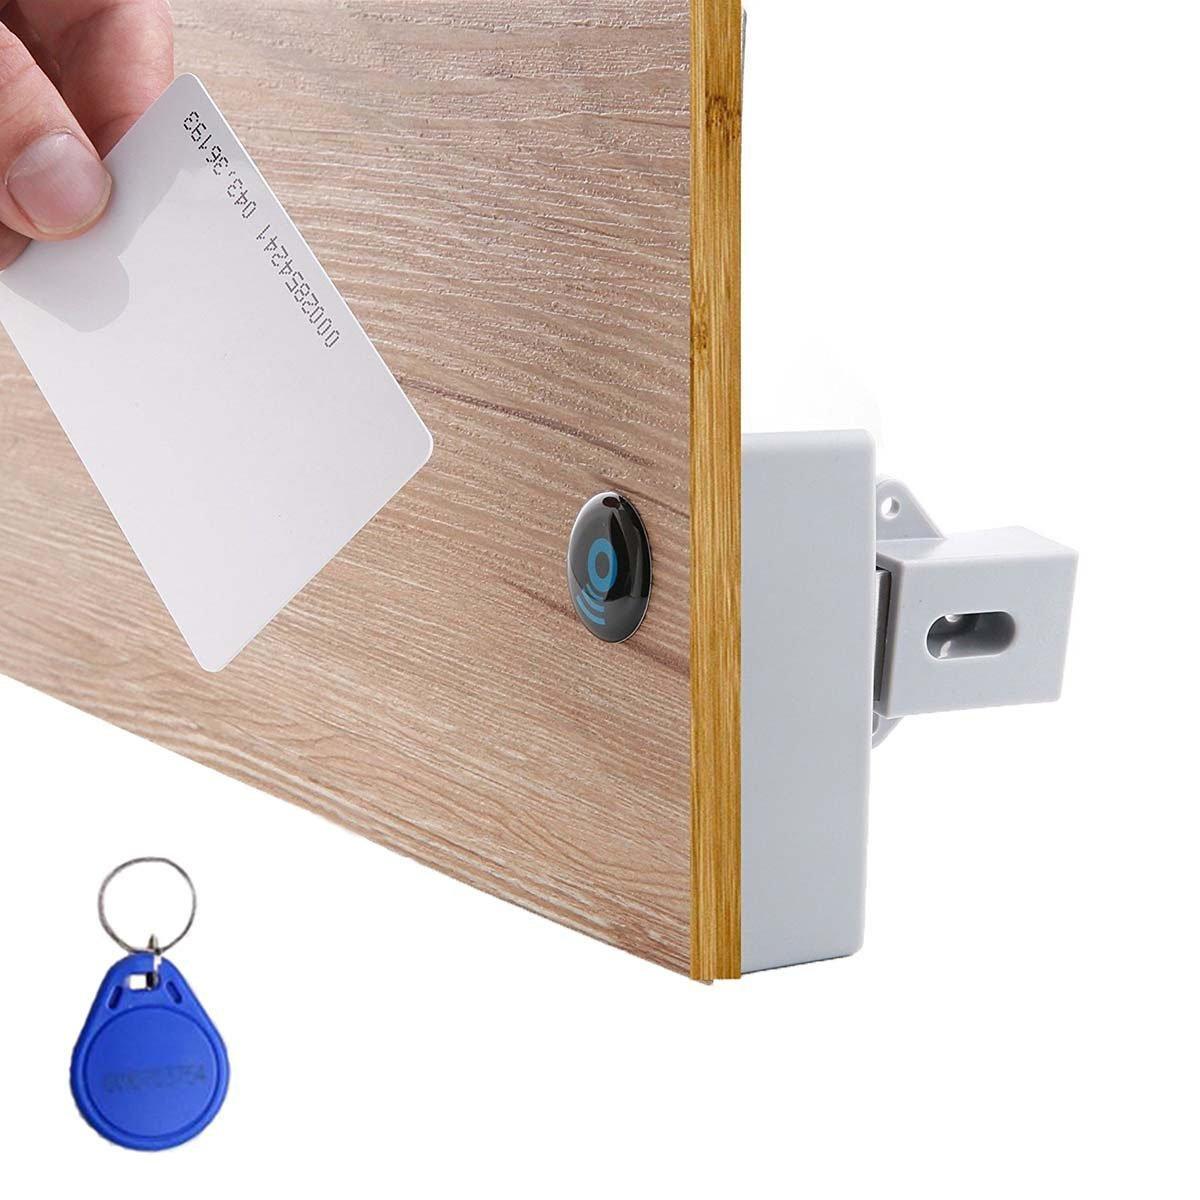 Diconna RFID Electronic Cabinet Lock Hidden DIY Lock Kit Set for Drawer Locker